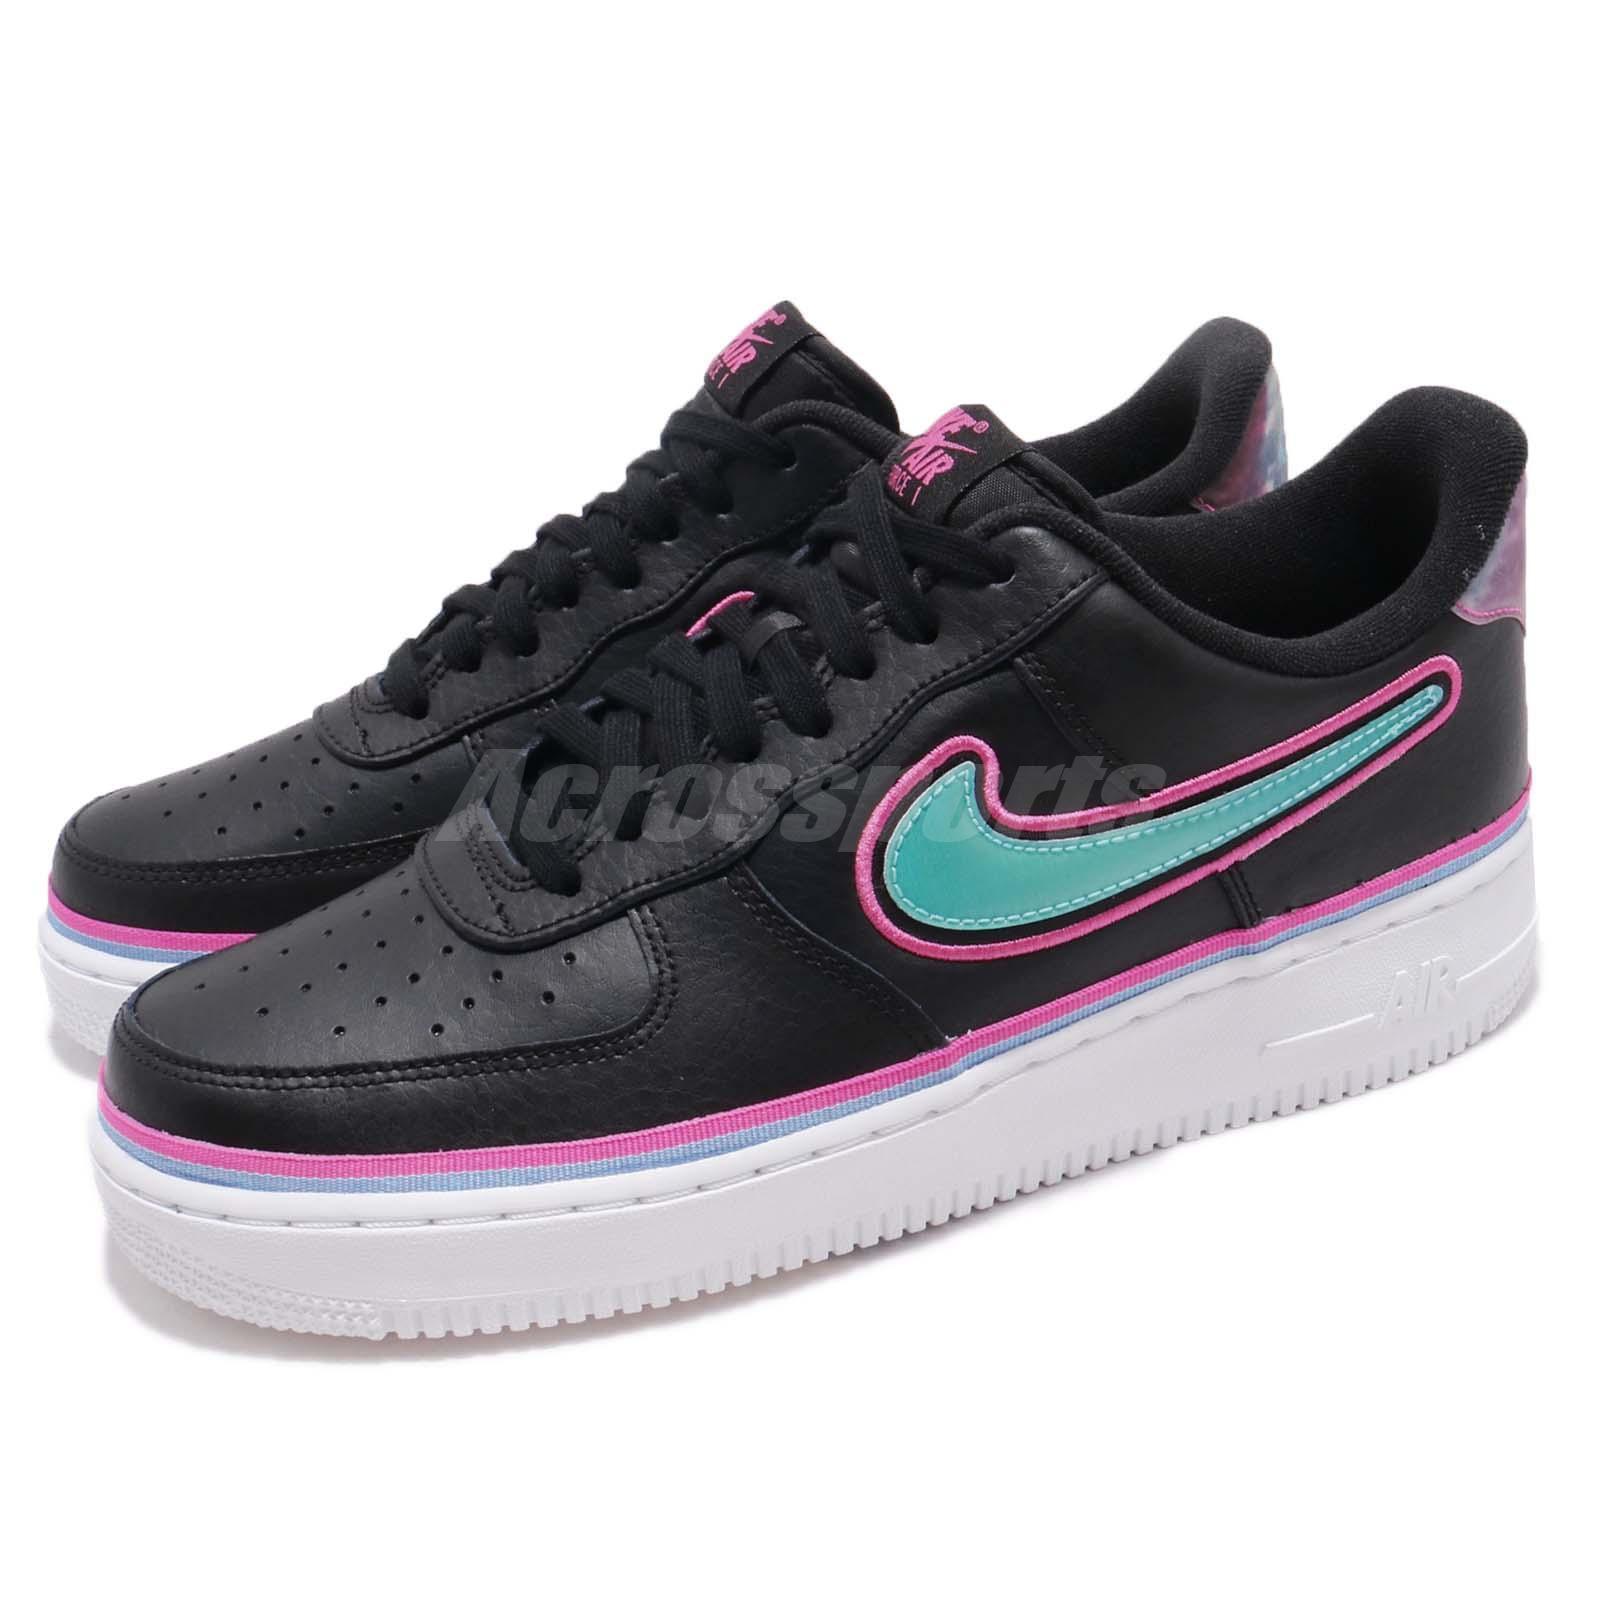 Nike Air Force 1 07 LV8 Sport AF1 NBA Maimi South Beach Men scarpe AJ7748-002 | Nuovo  | Scolaro/Ragazze Scarpa